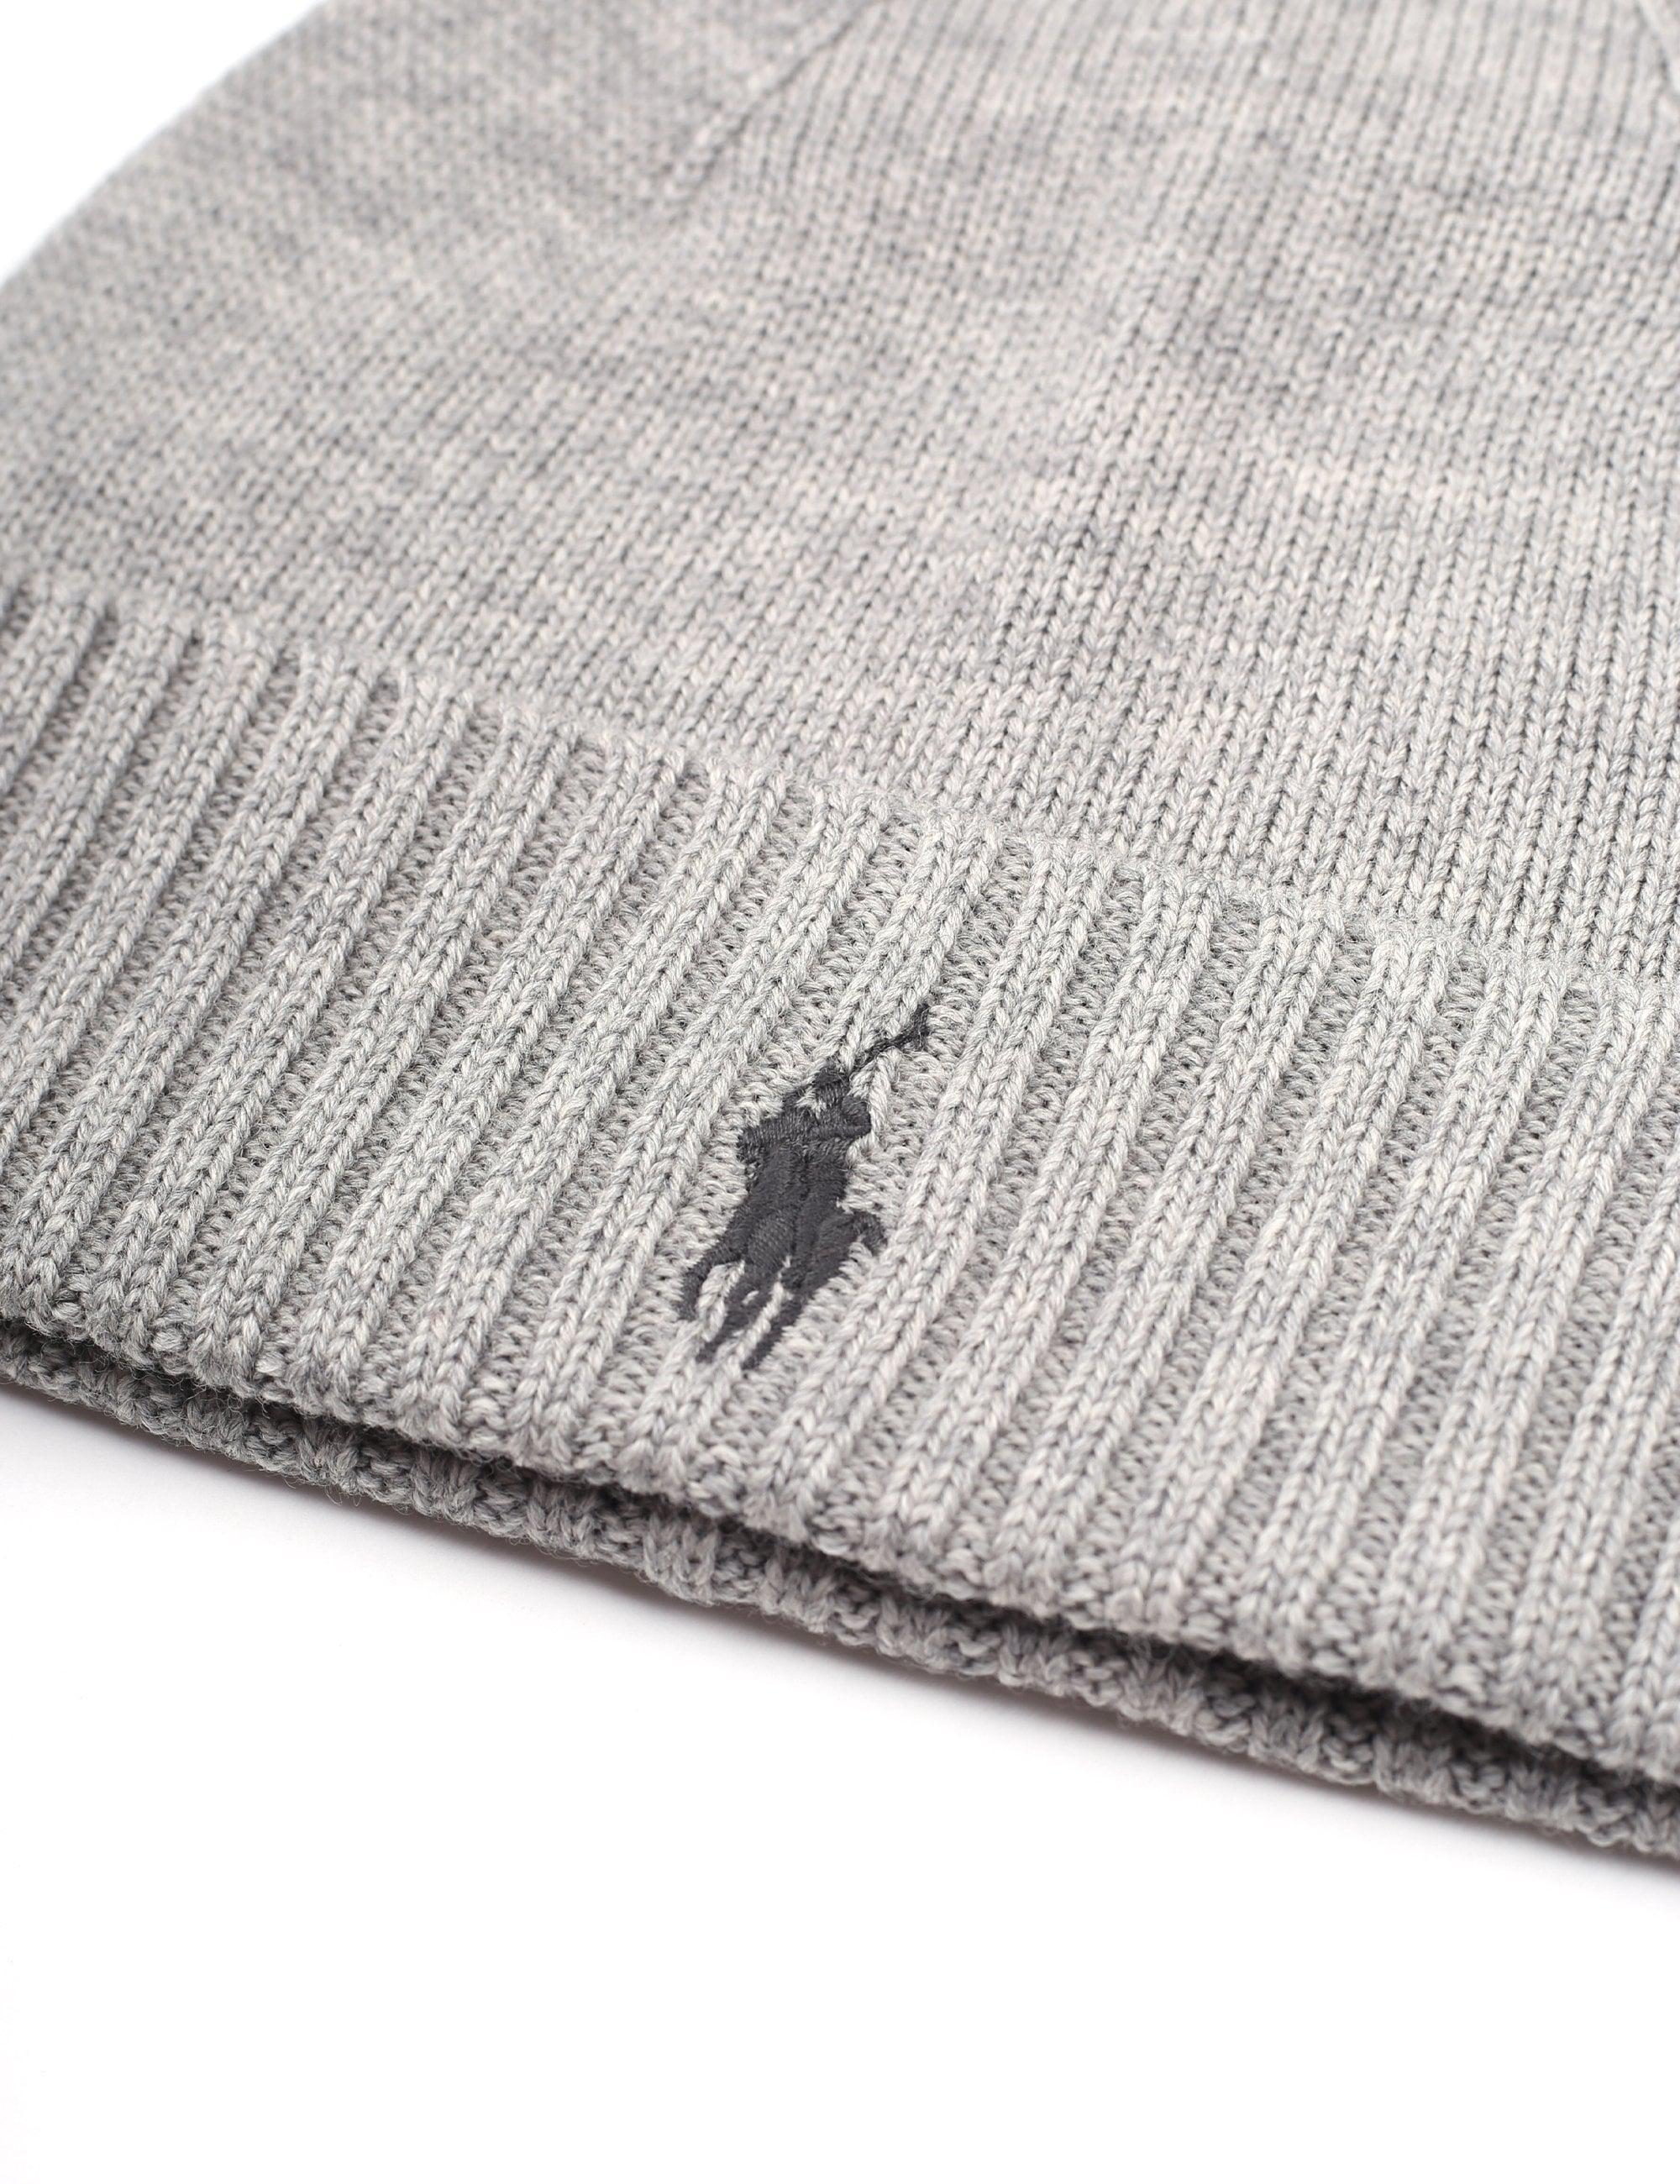 1327a1e901c Polo Ralph Lauren Men s Fo Beanie Hat Grey in Gray for Men - Lyst